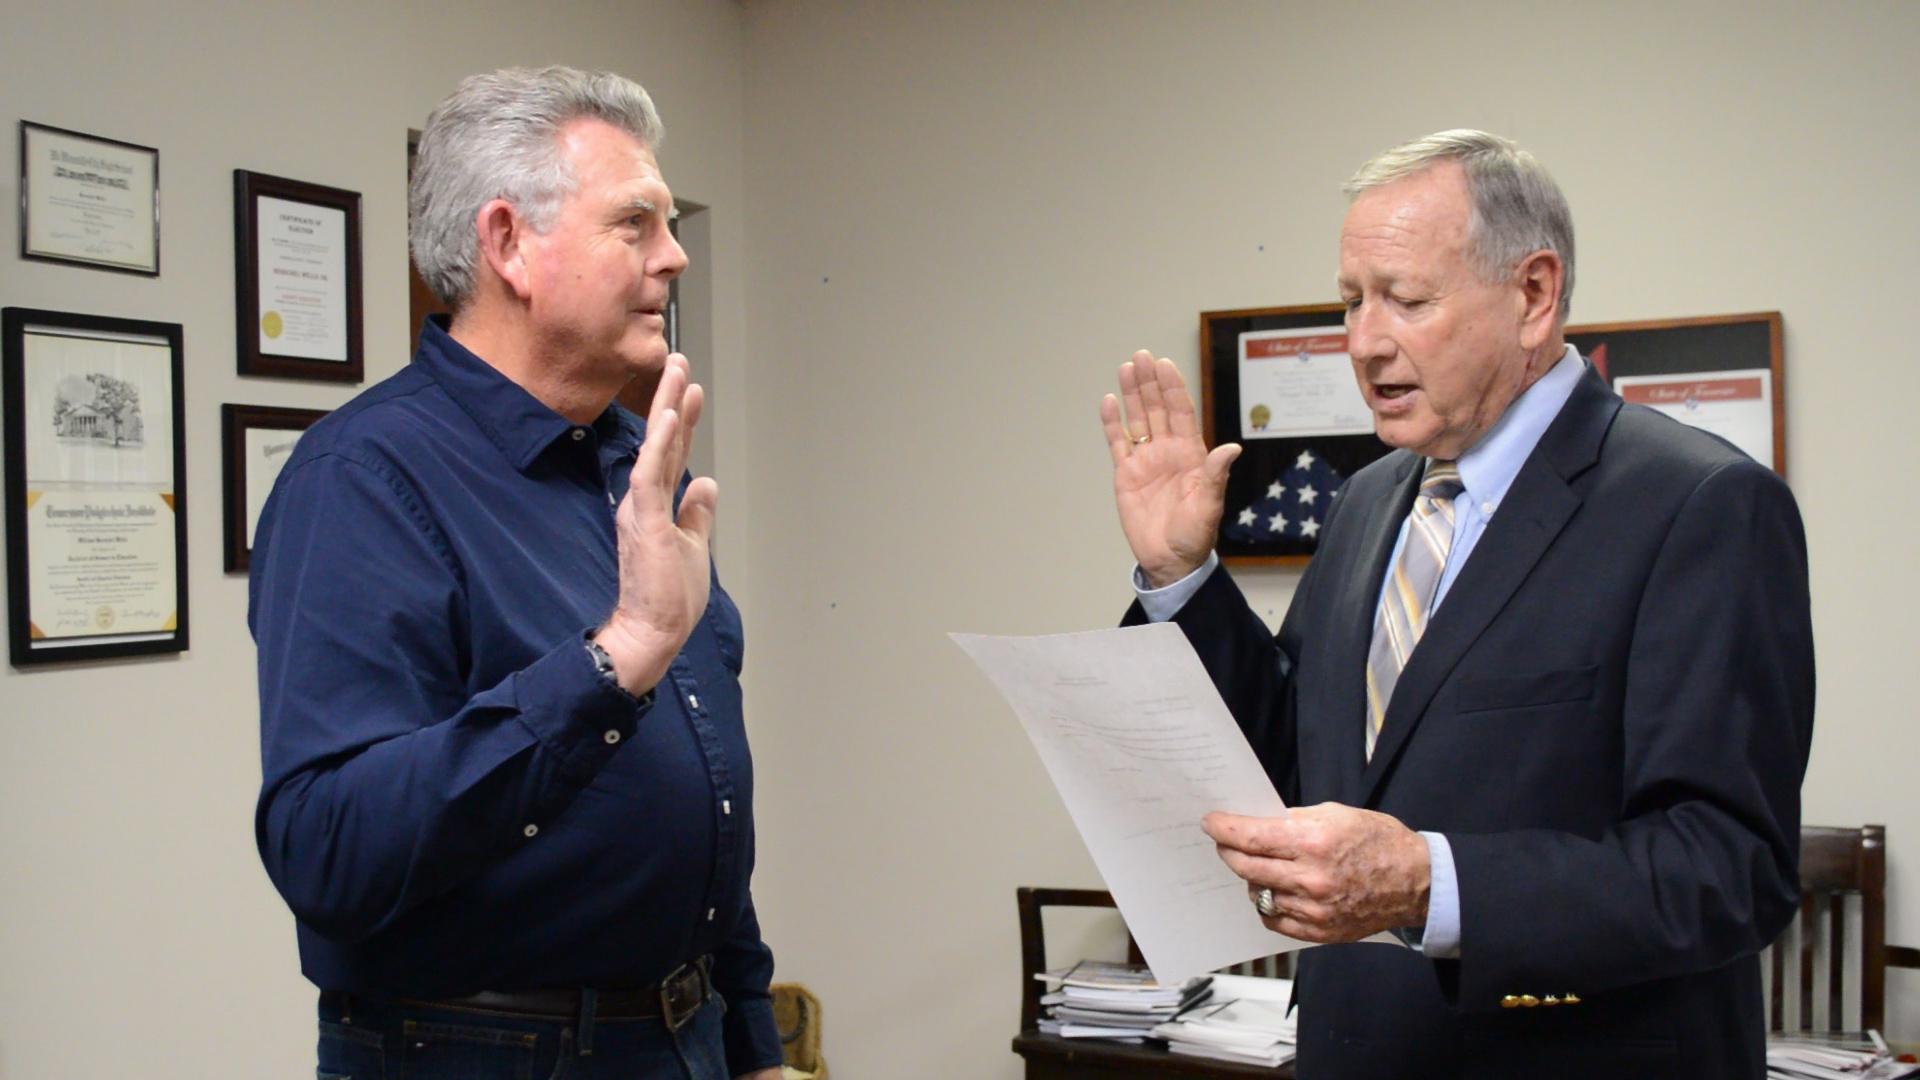 VIDEO - Stout sworn as commissioner